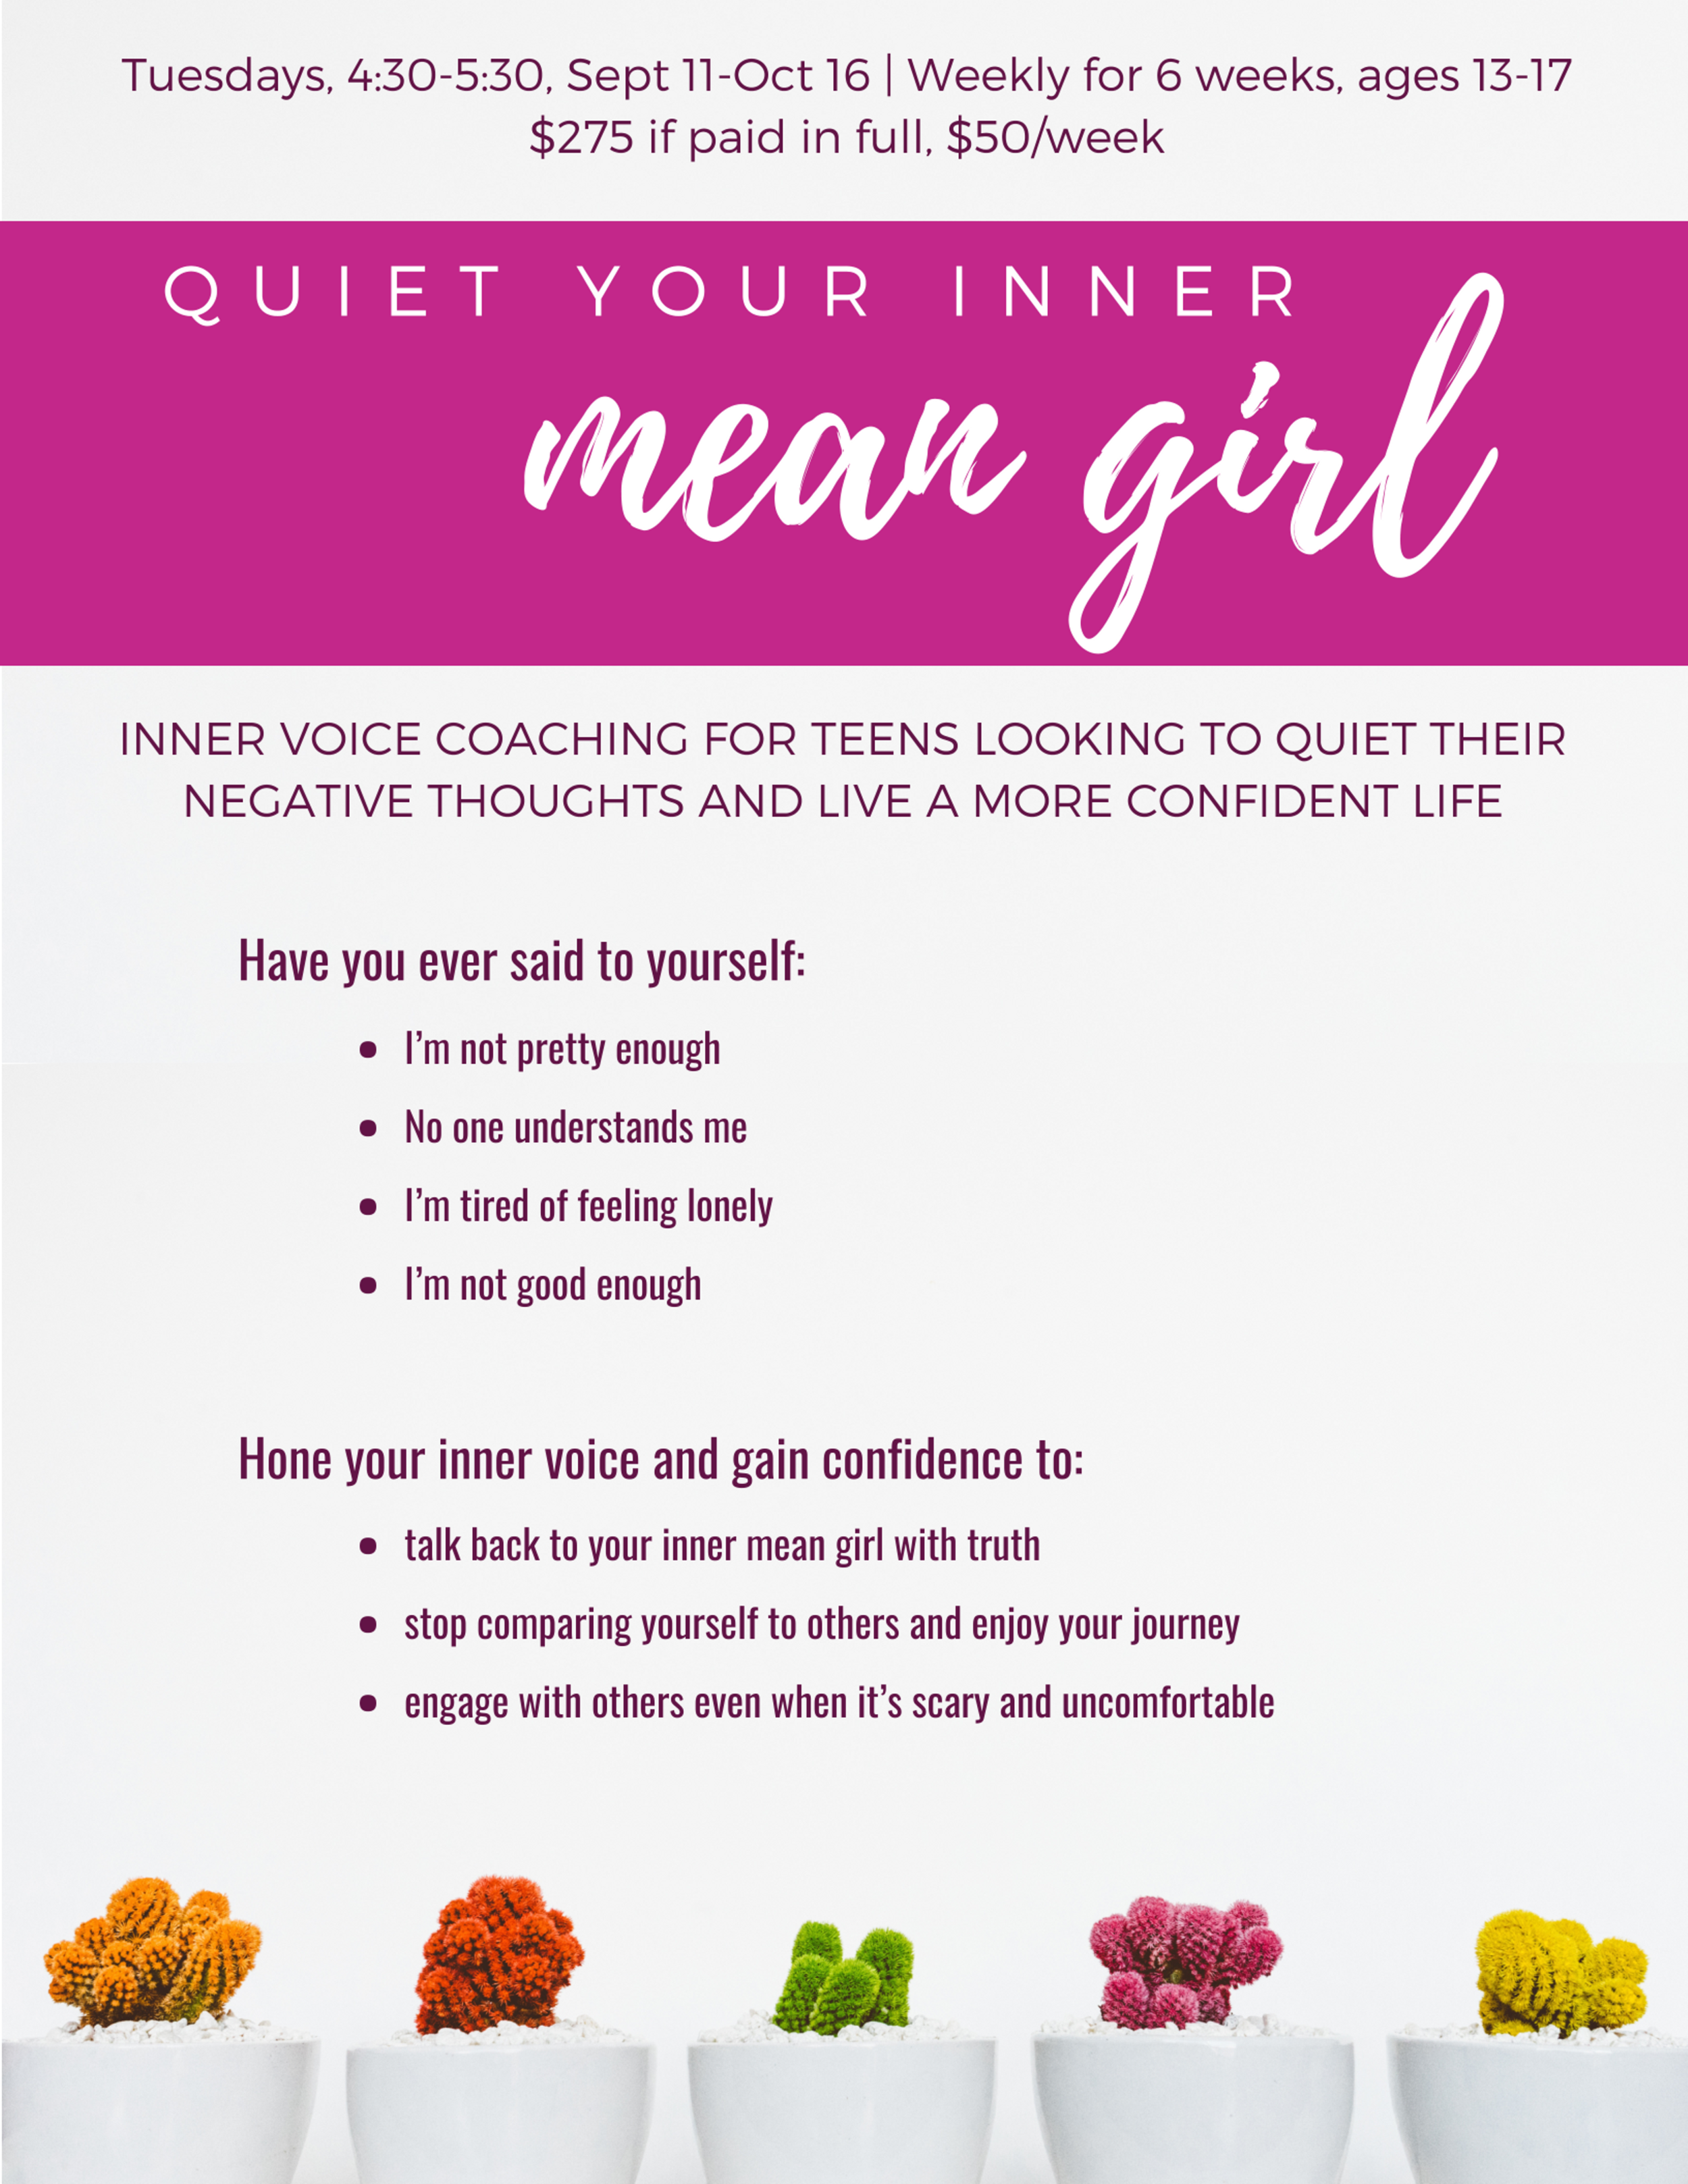 Quiet Your Inner Mean Girl TEENS-poster.png